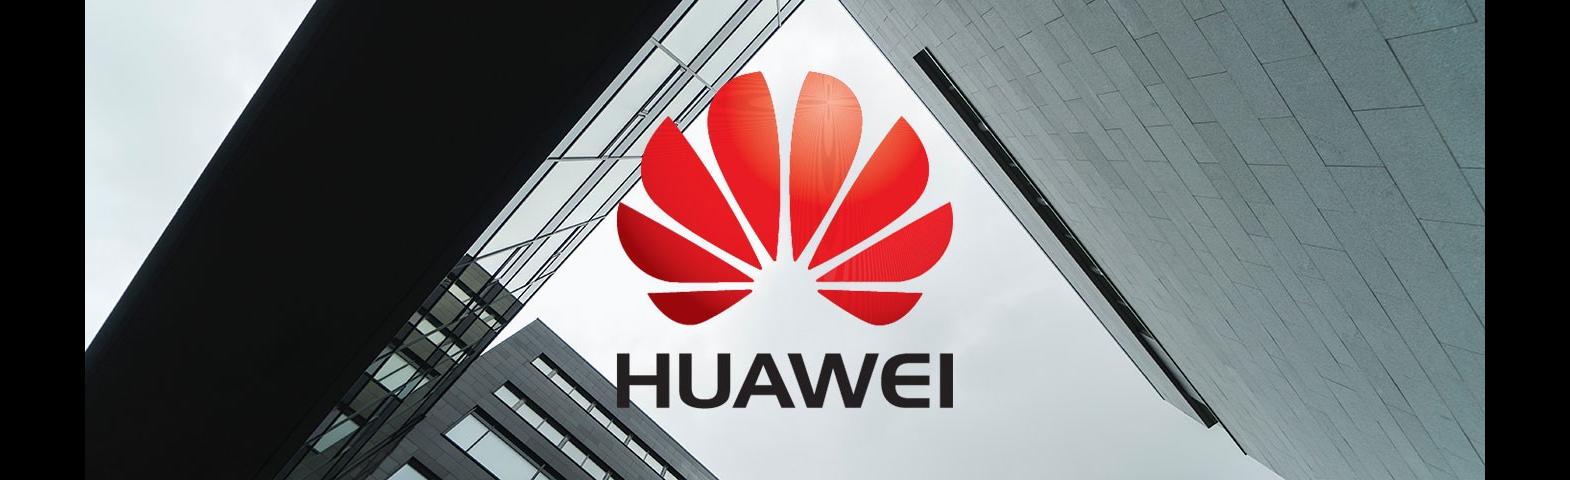 Huawei | Lease Renegotiation